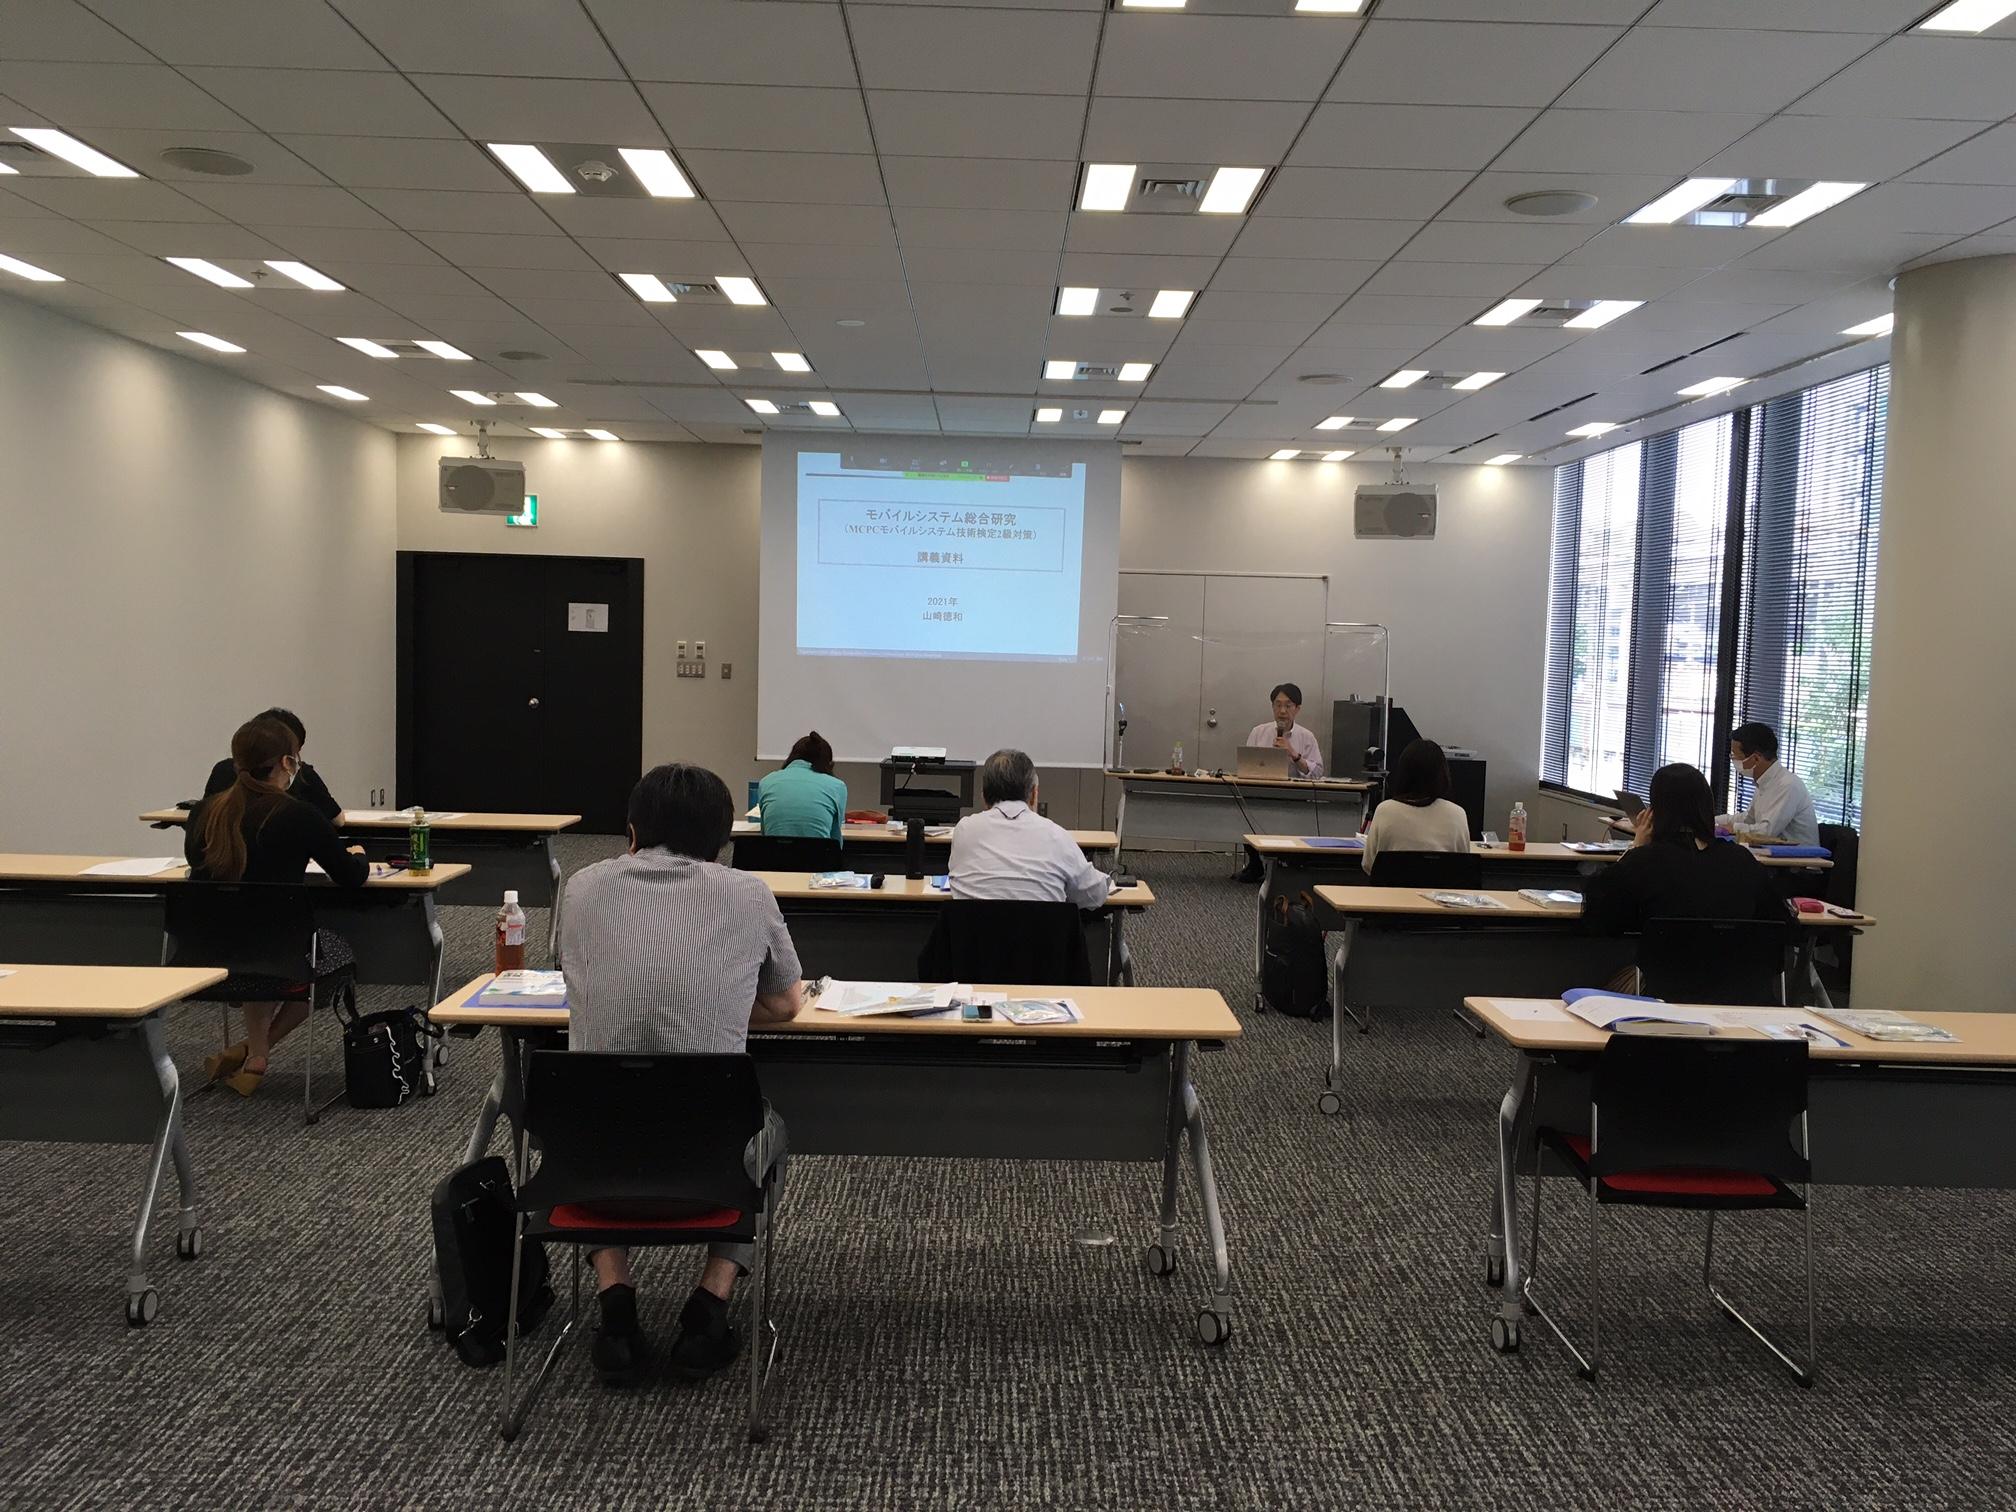 MCPCモバイル・IoT技術検定対策講習会を開催